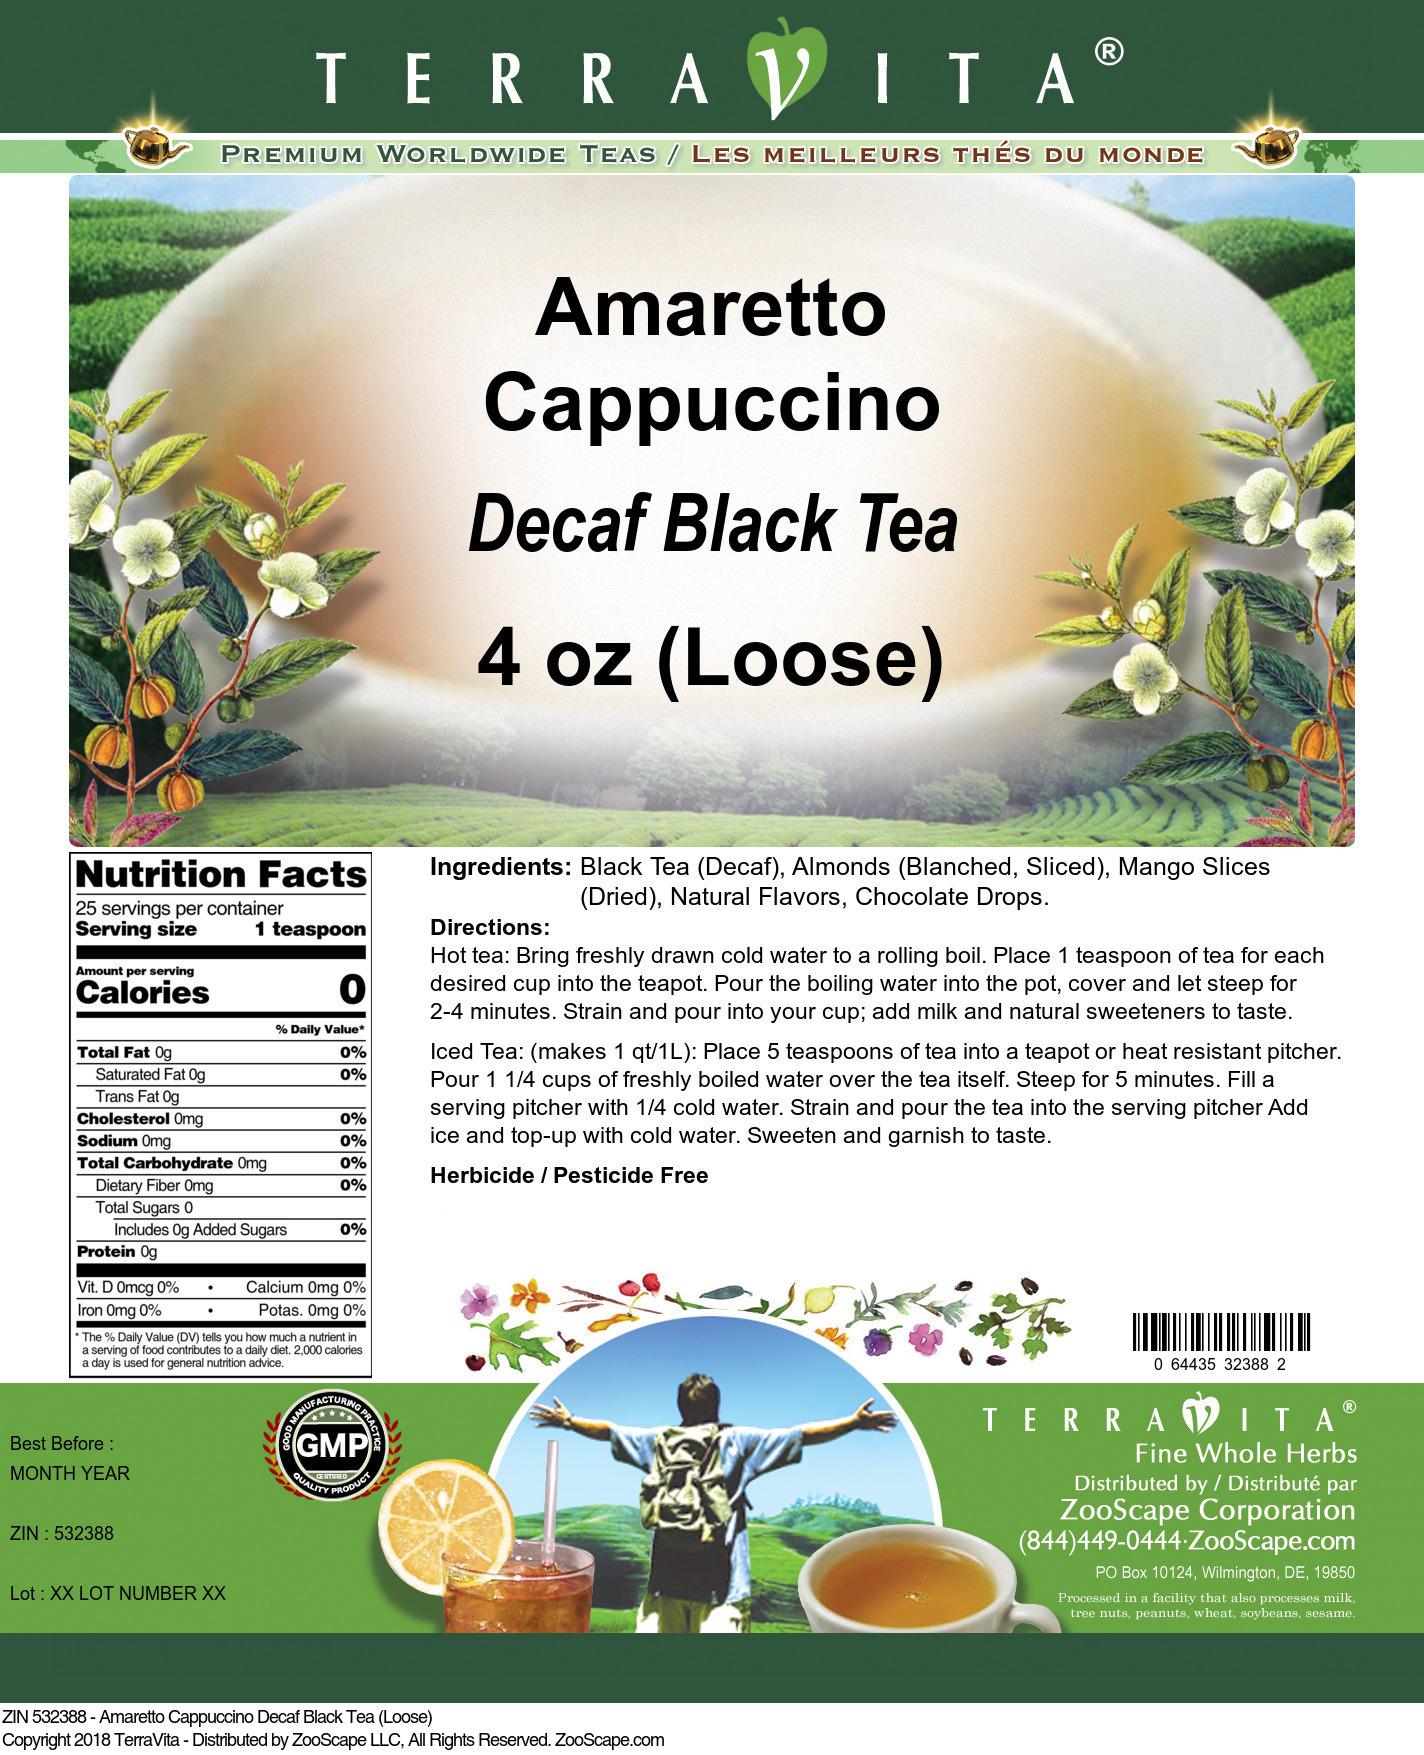 Amaretto Cappuccino Decaf Black Tea (Loose)